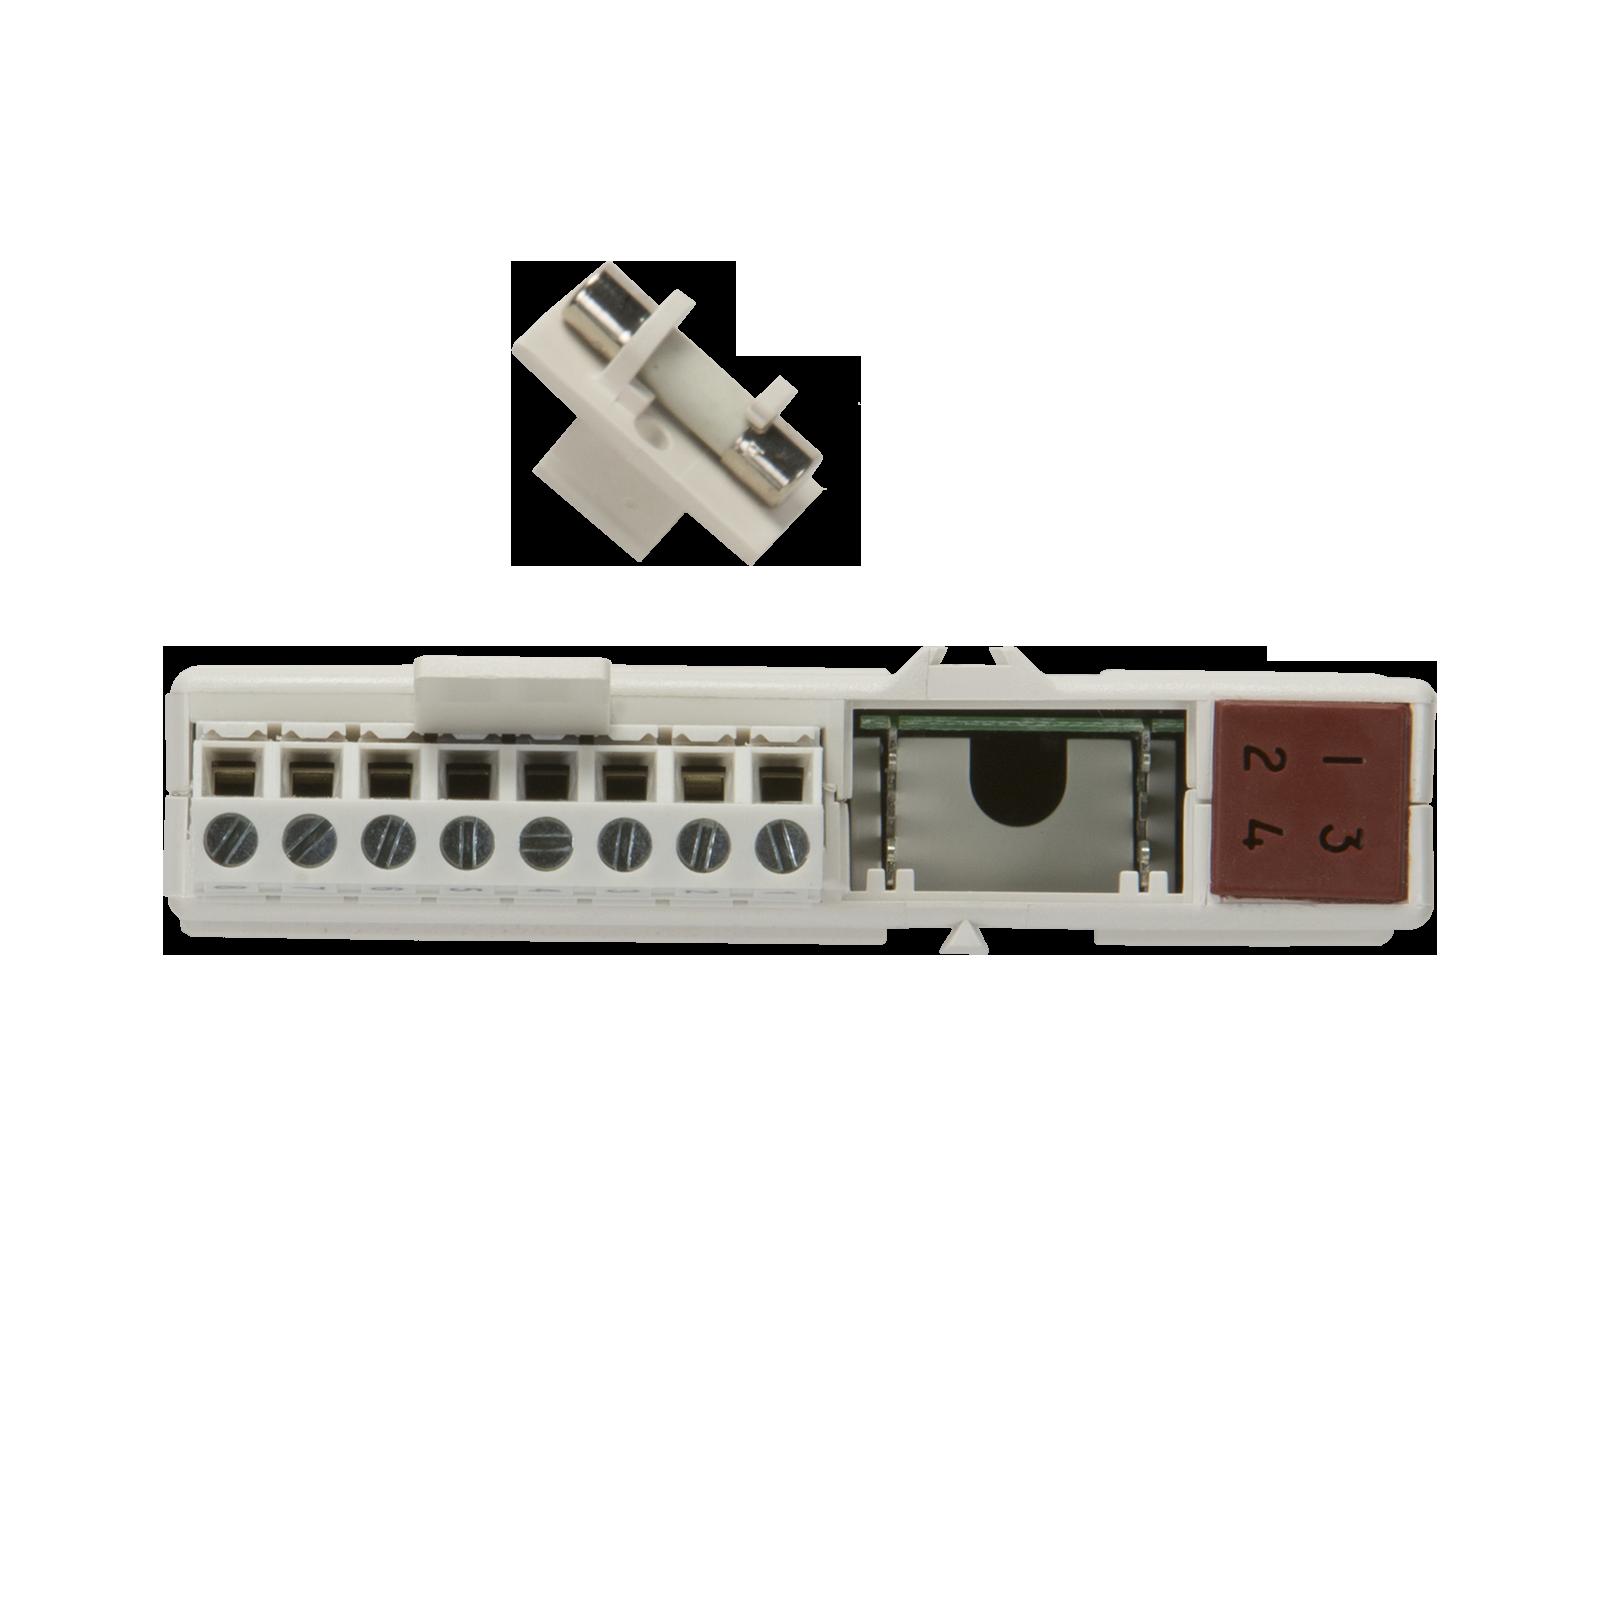 Opto22 Snap Odc5snk 4 Ch 5 60 Vdc Digital Discrete Output Opto 22 Wiring Diagram Previous